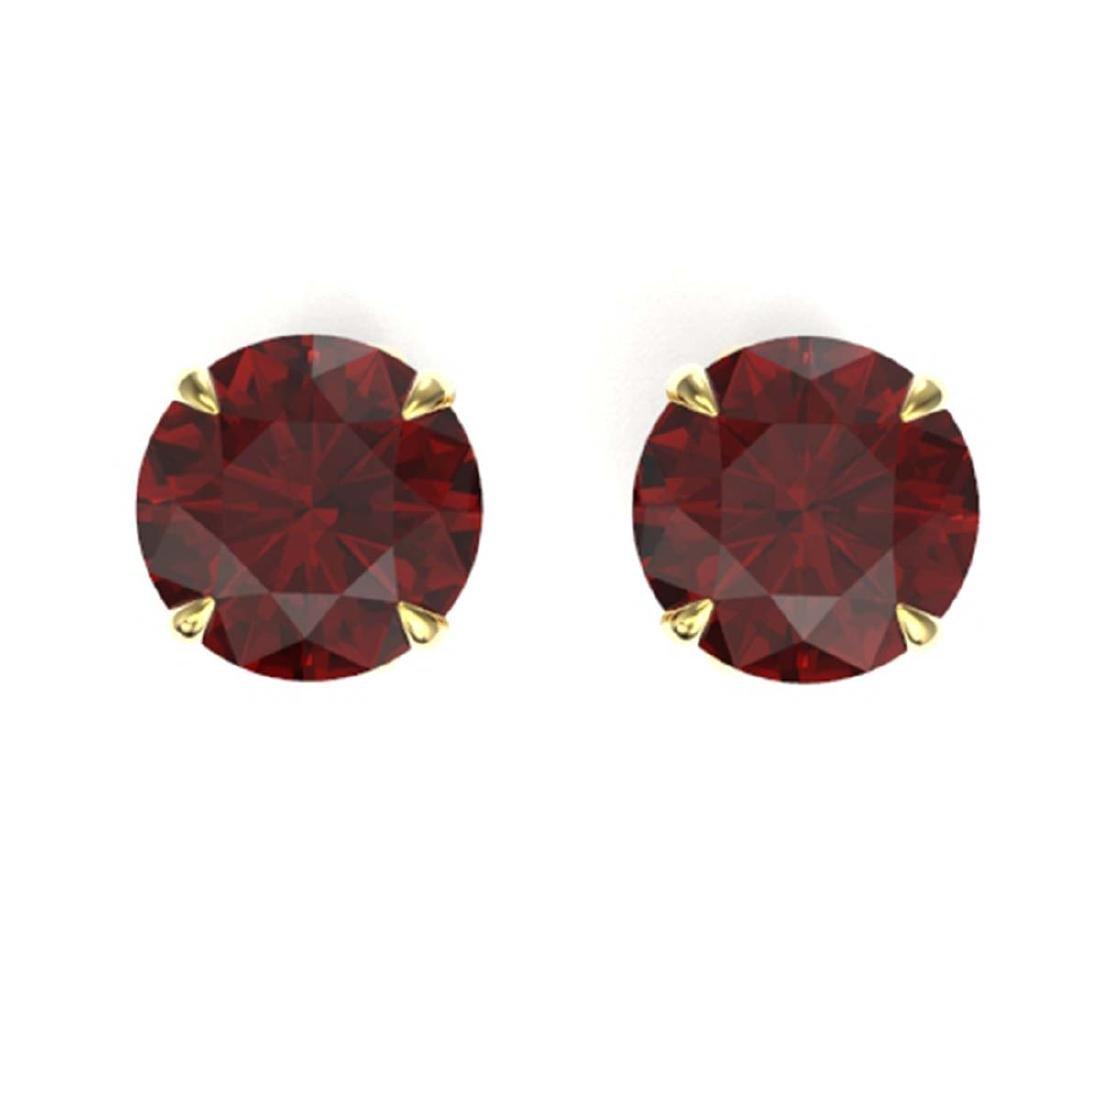 4 CTW Genuine Garnet Solitaire Stud Earrings 18K Yellow